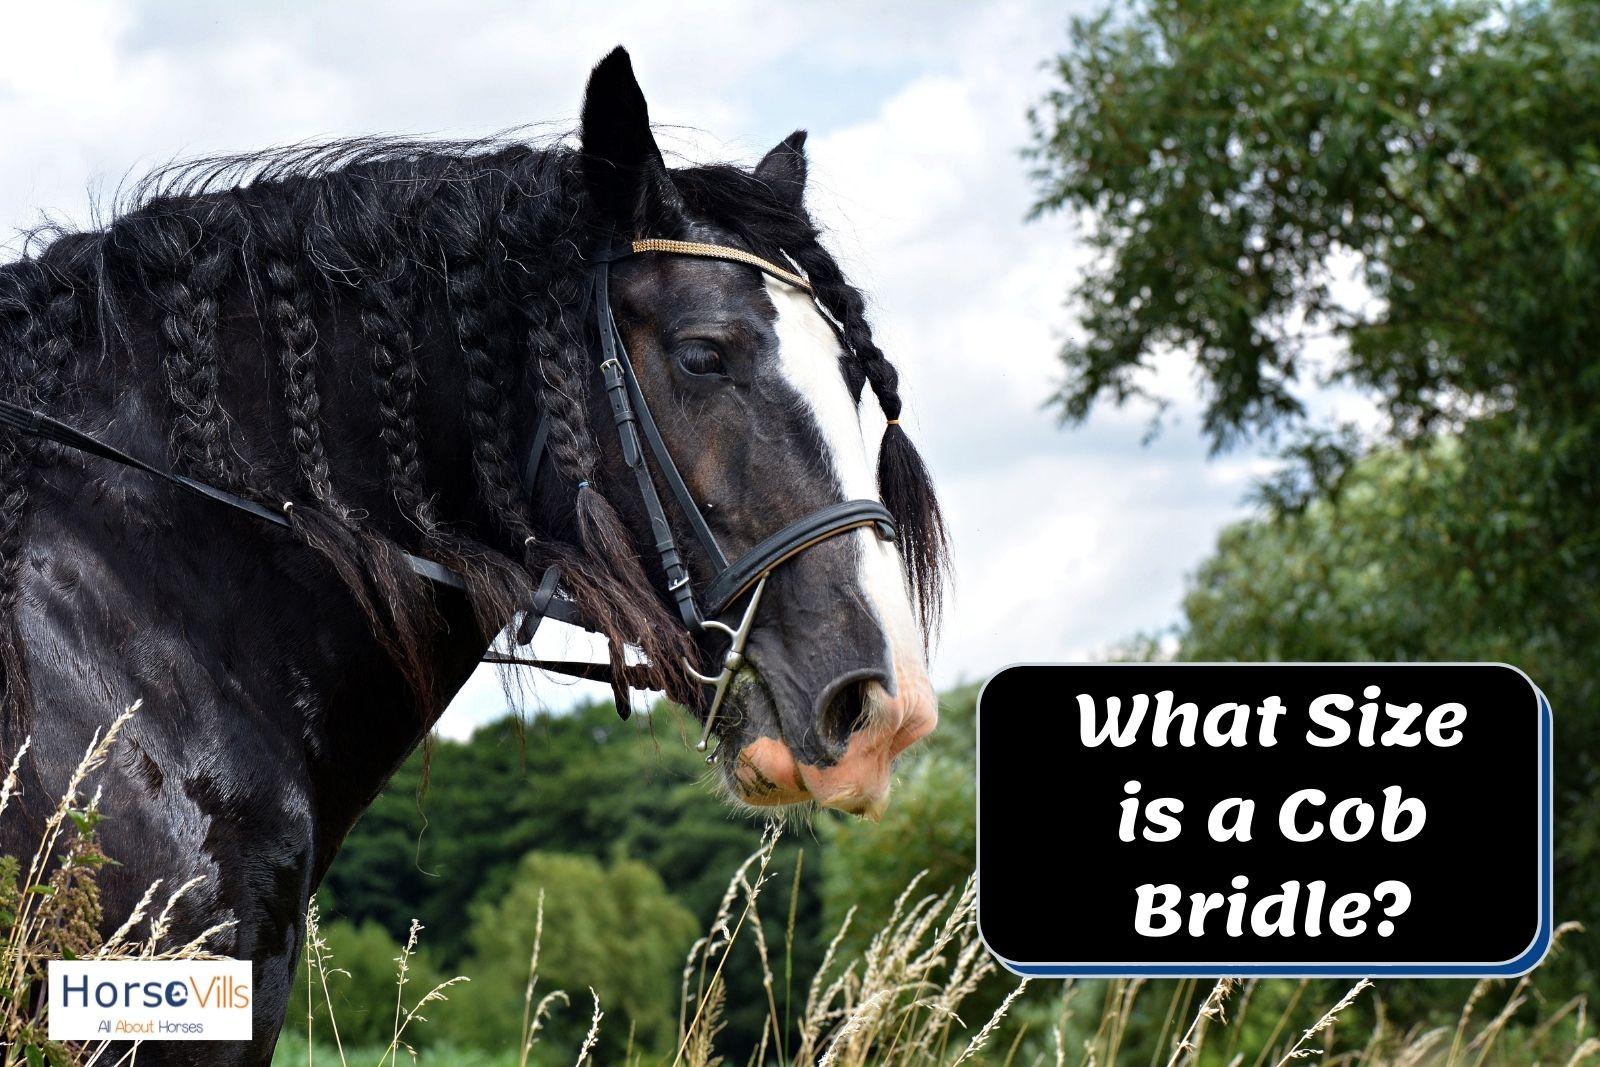 a gorgeous black horse with cob bridle